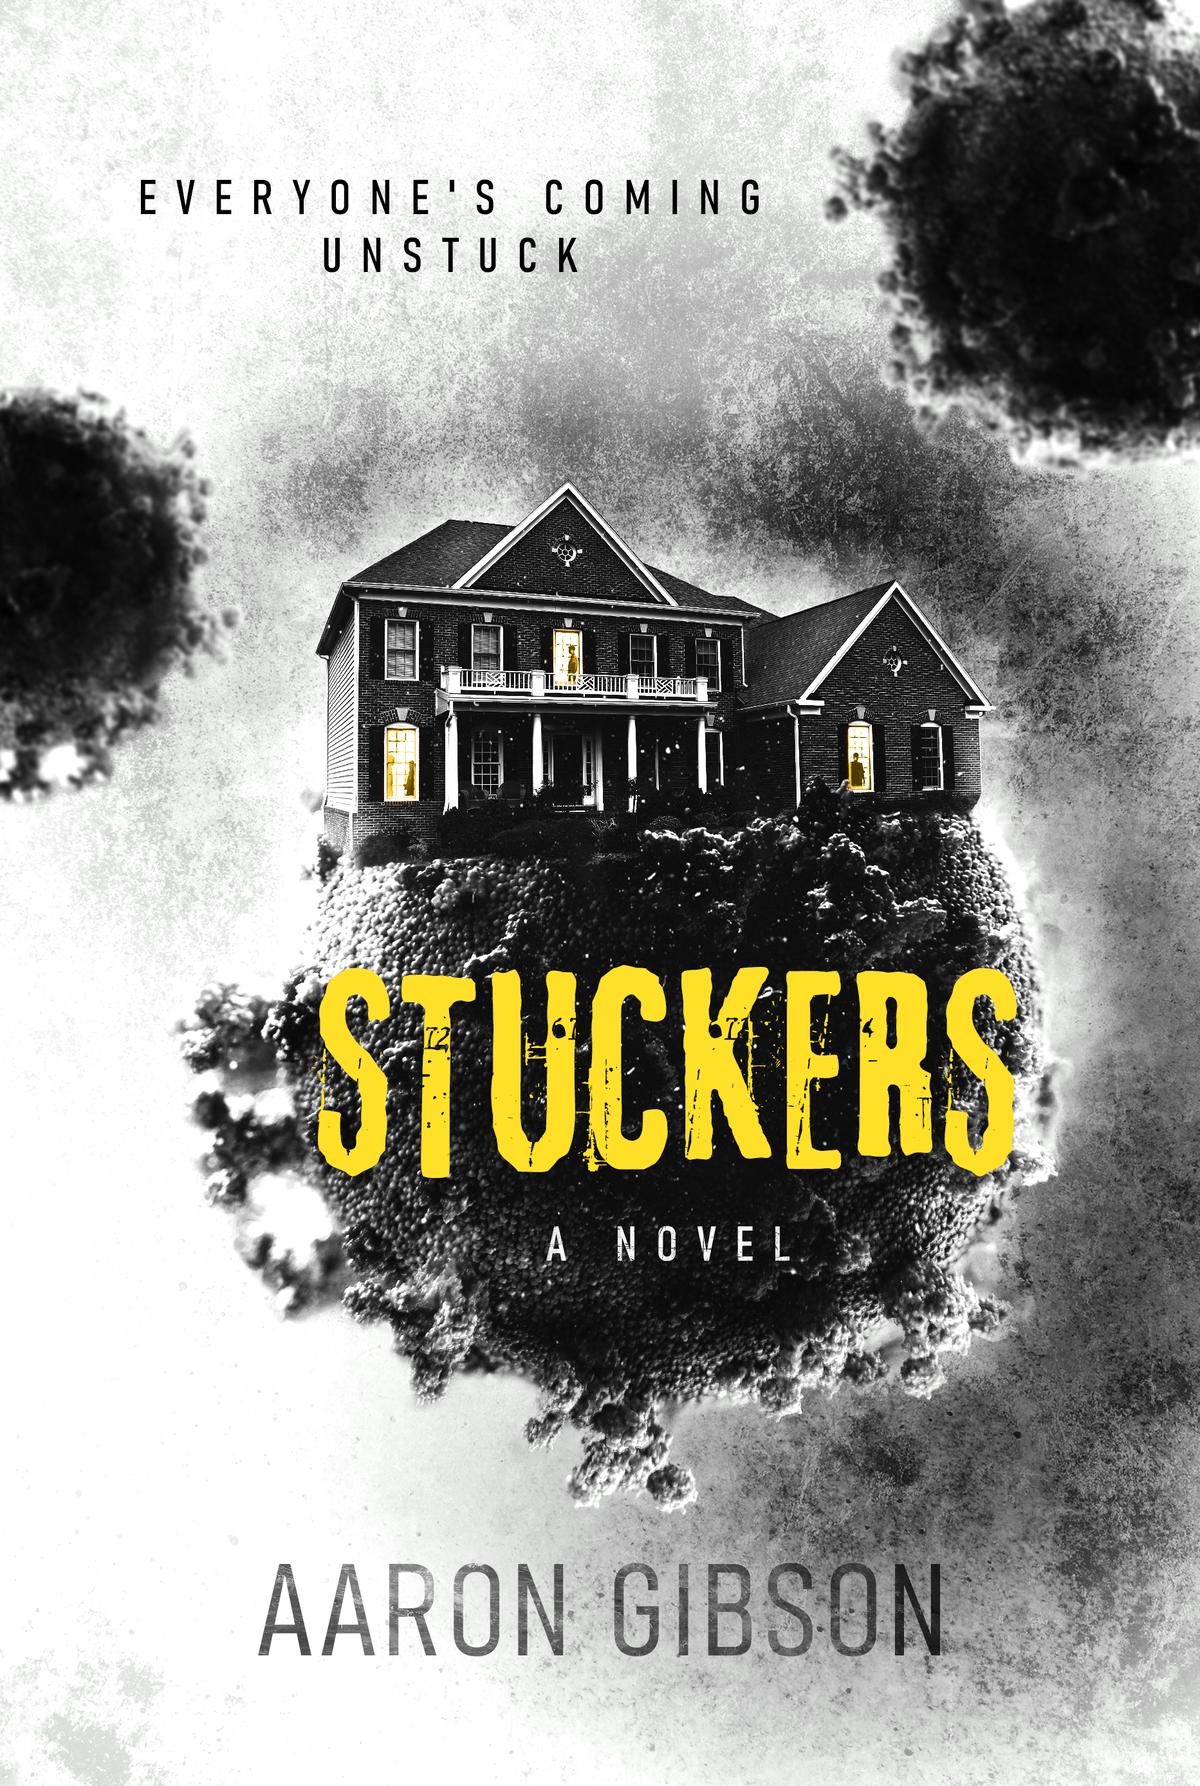 Cover for novel that's a dark family drama w/ black humour, set during Coronavirus pandemic.